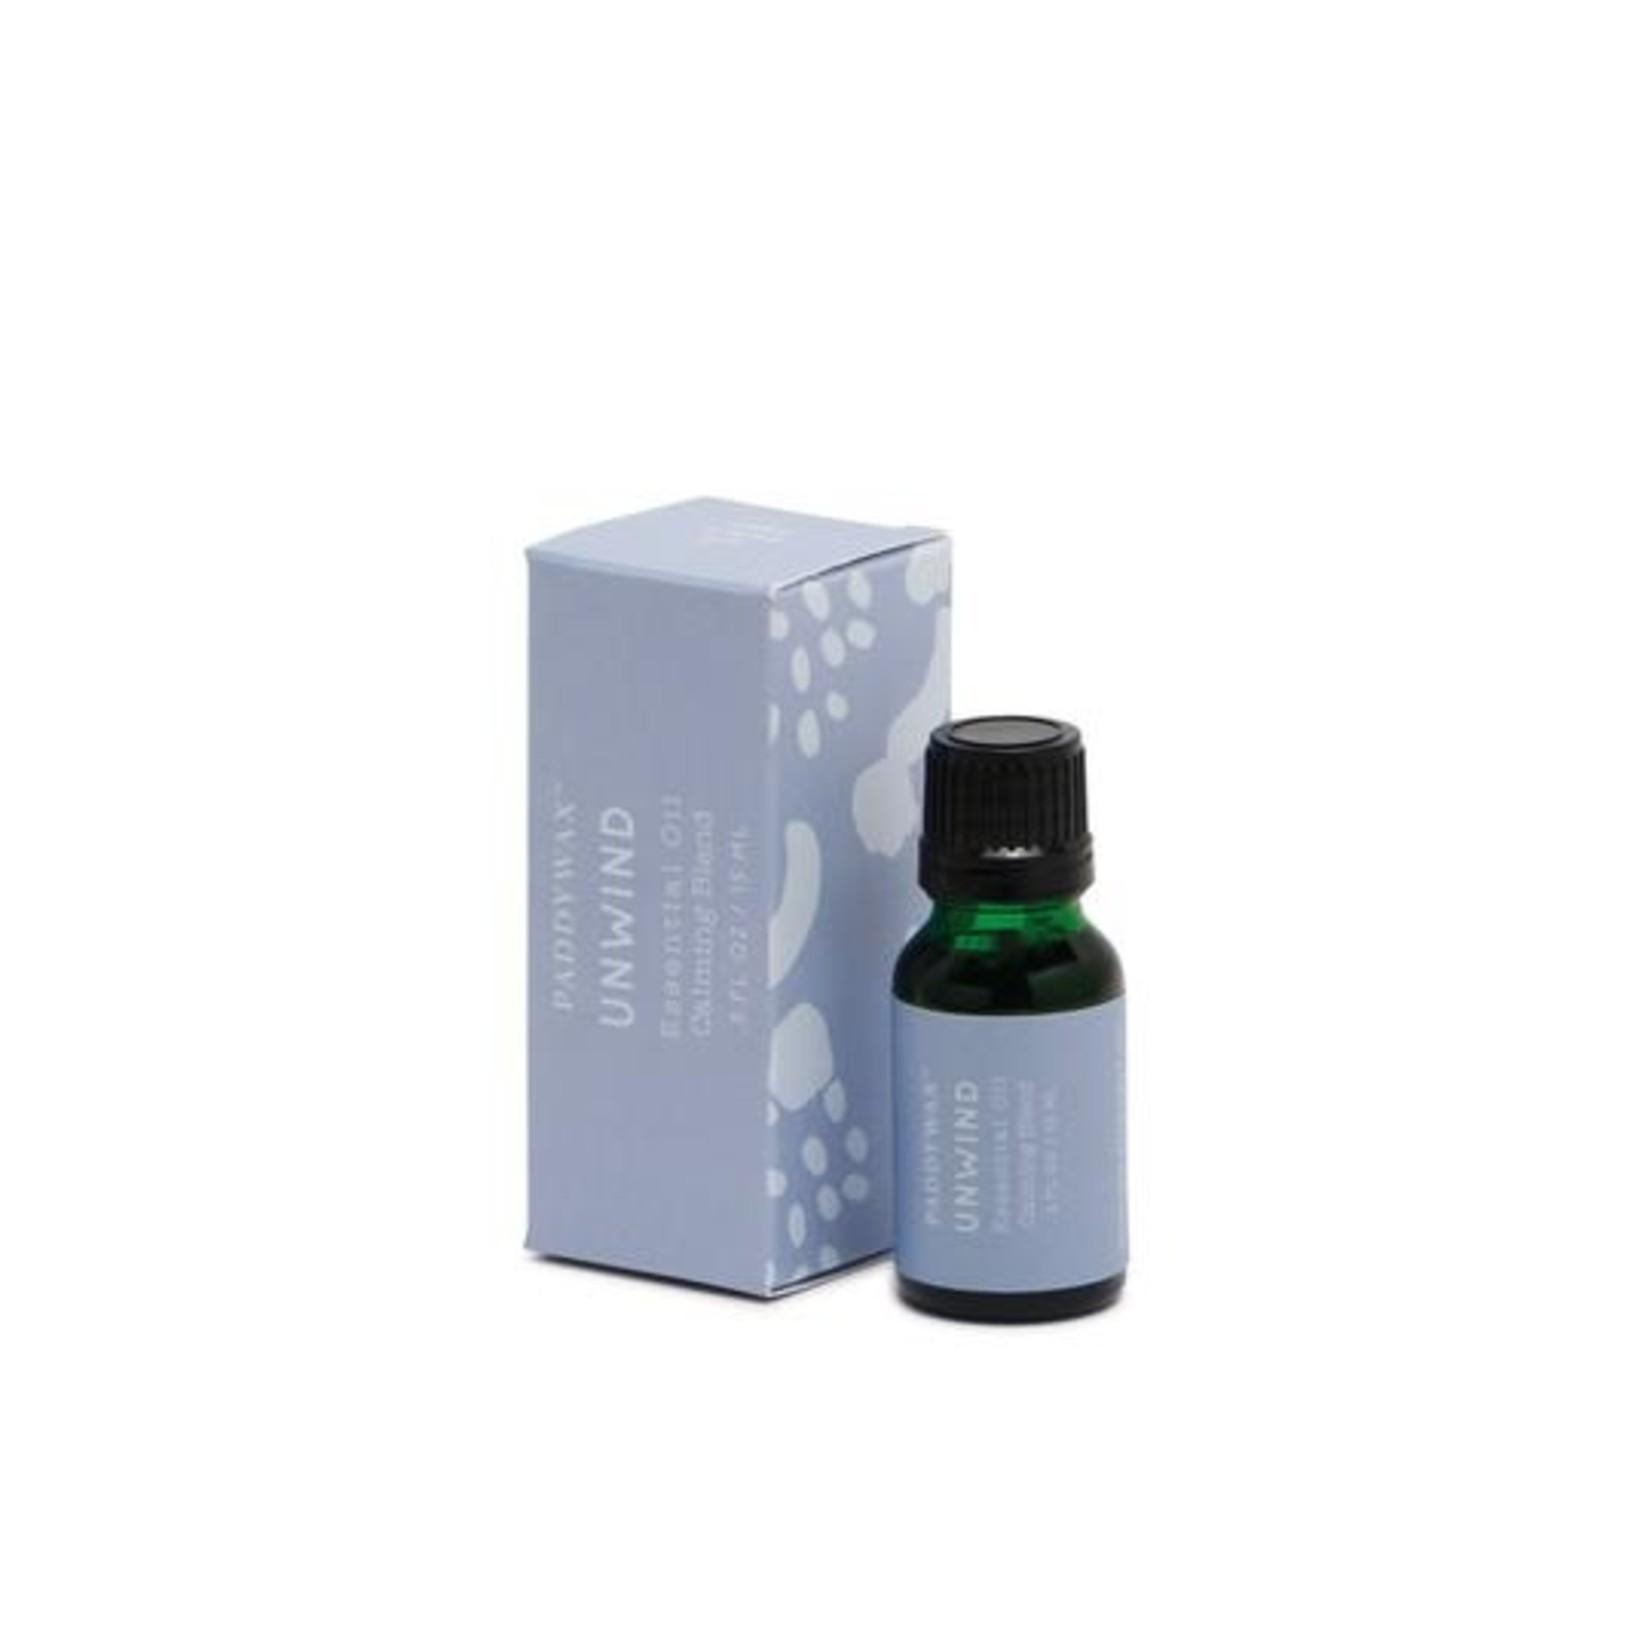 Paddywax Essential Oil